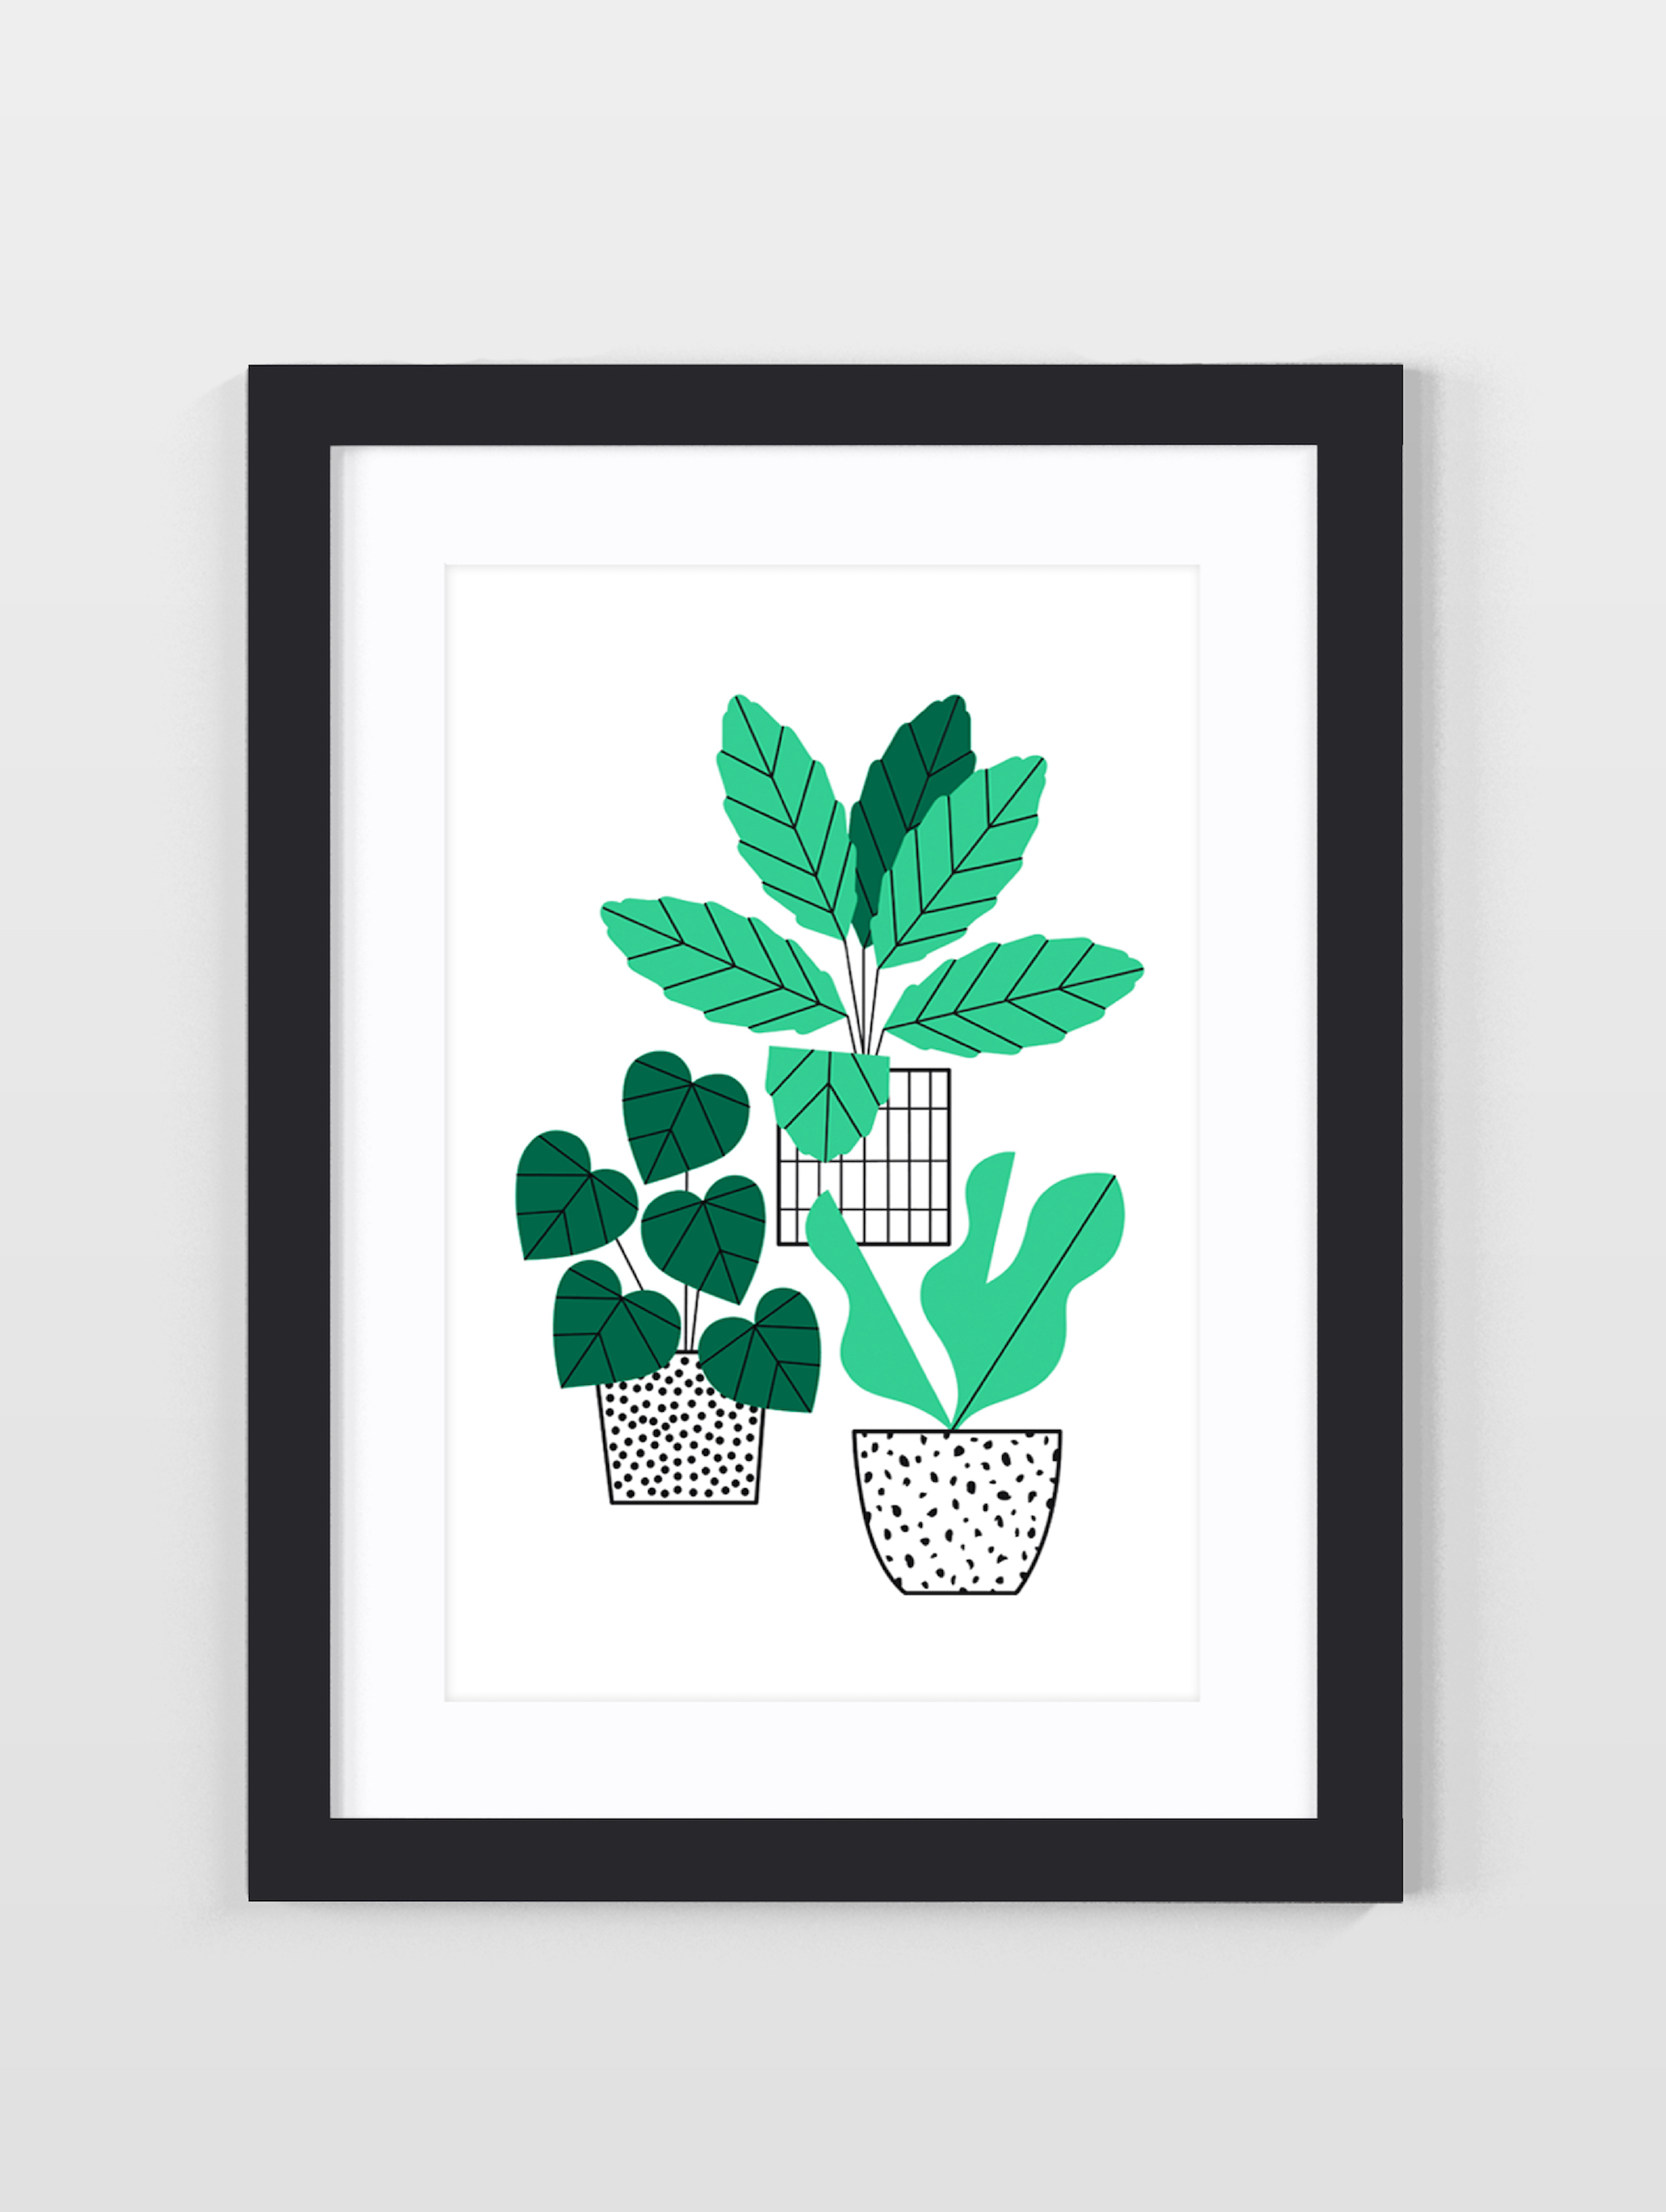 House Plants by Sarah Abbott